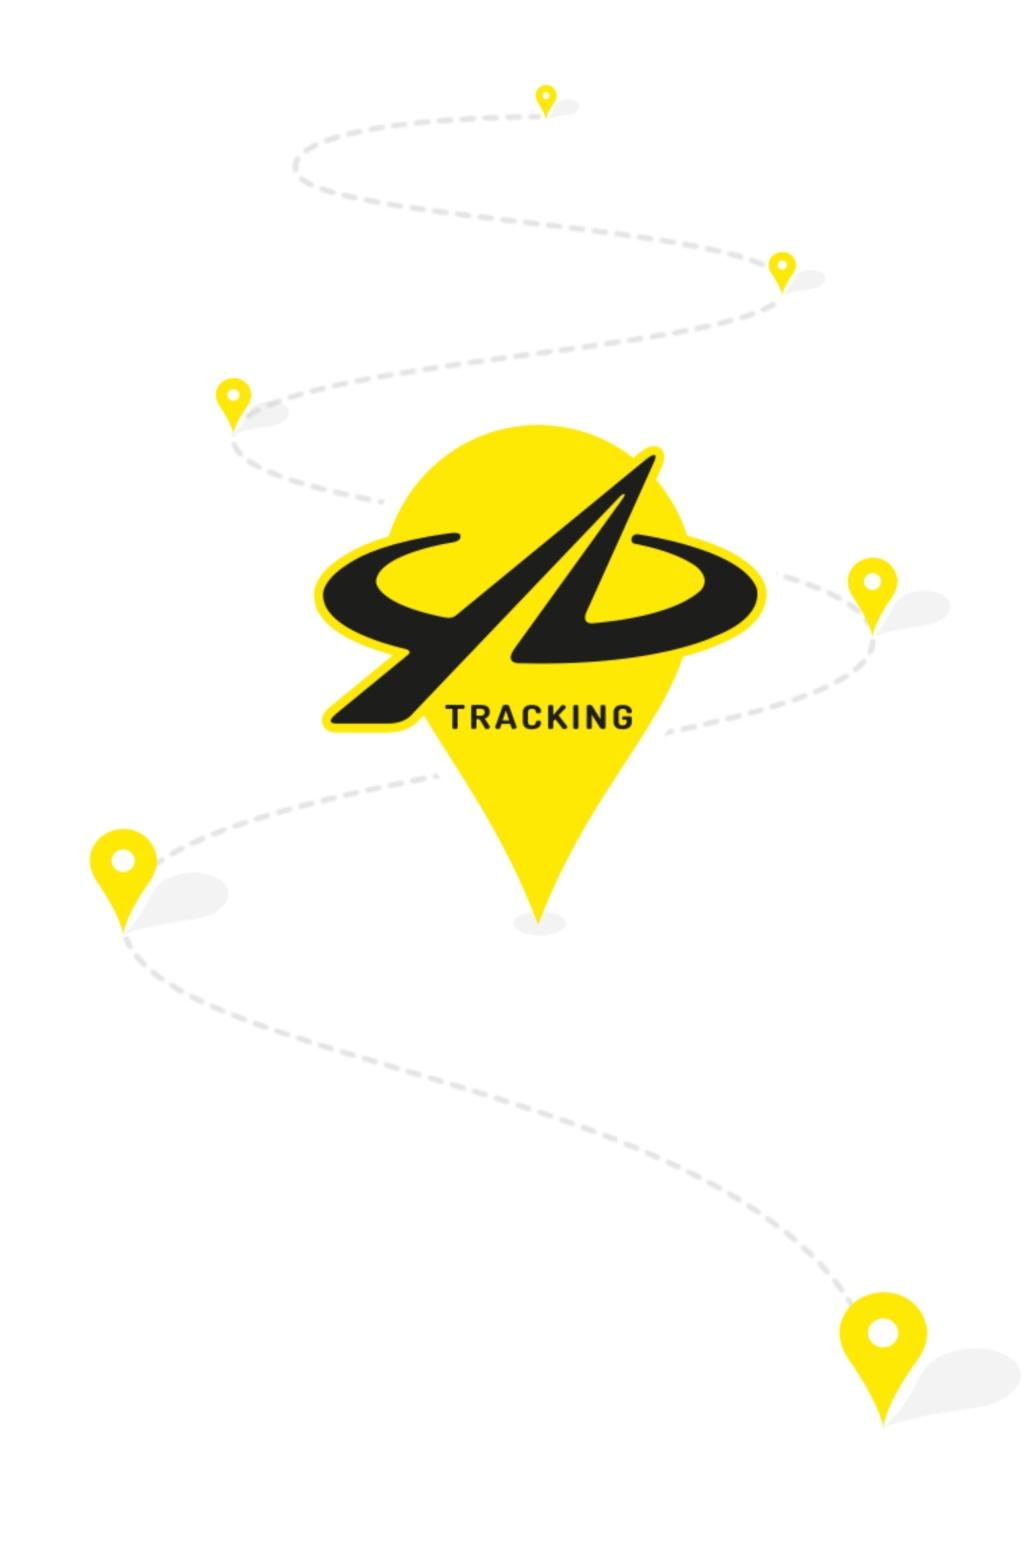 Screenshot_20190804_141709_com.yellowbrick.raceviewer.jpg